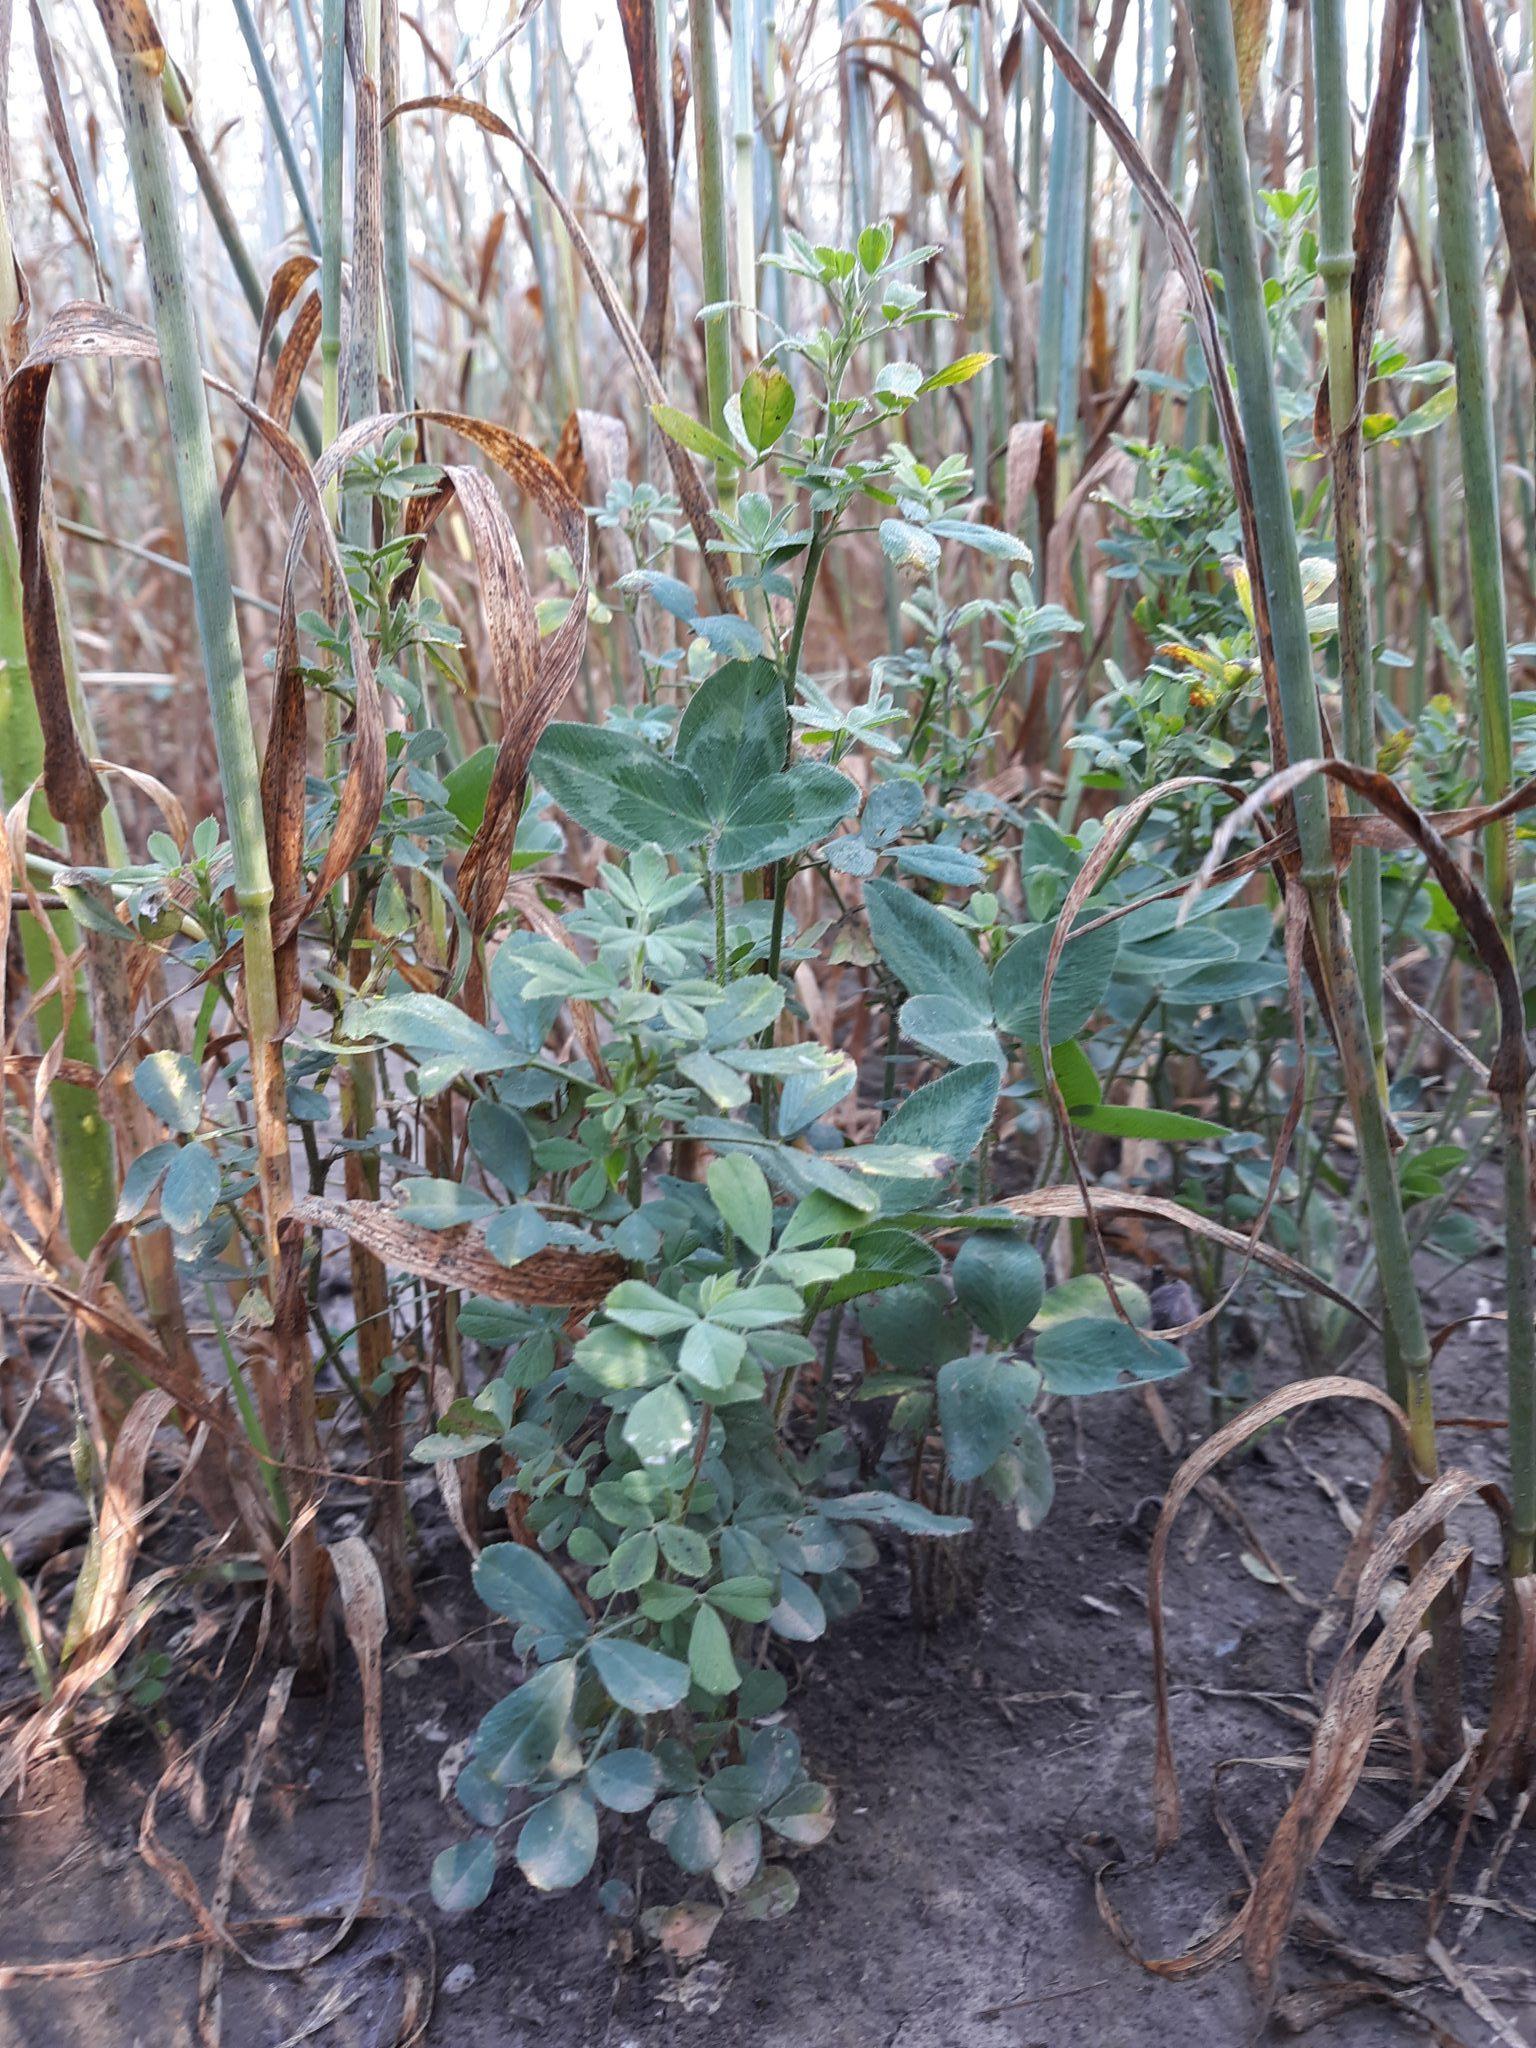 Alfalfa and clover